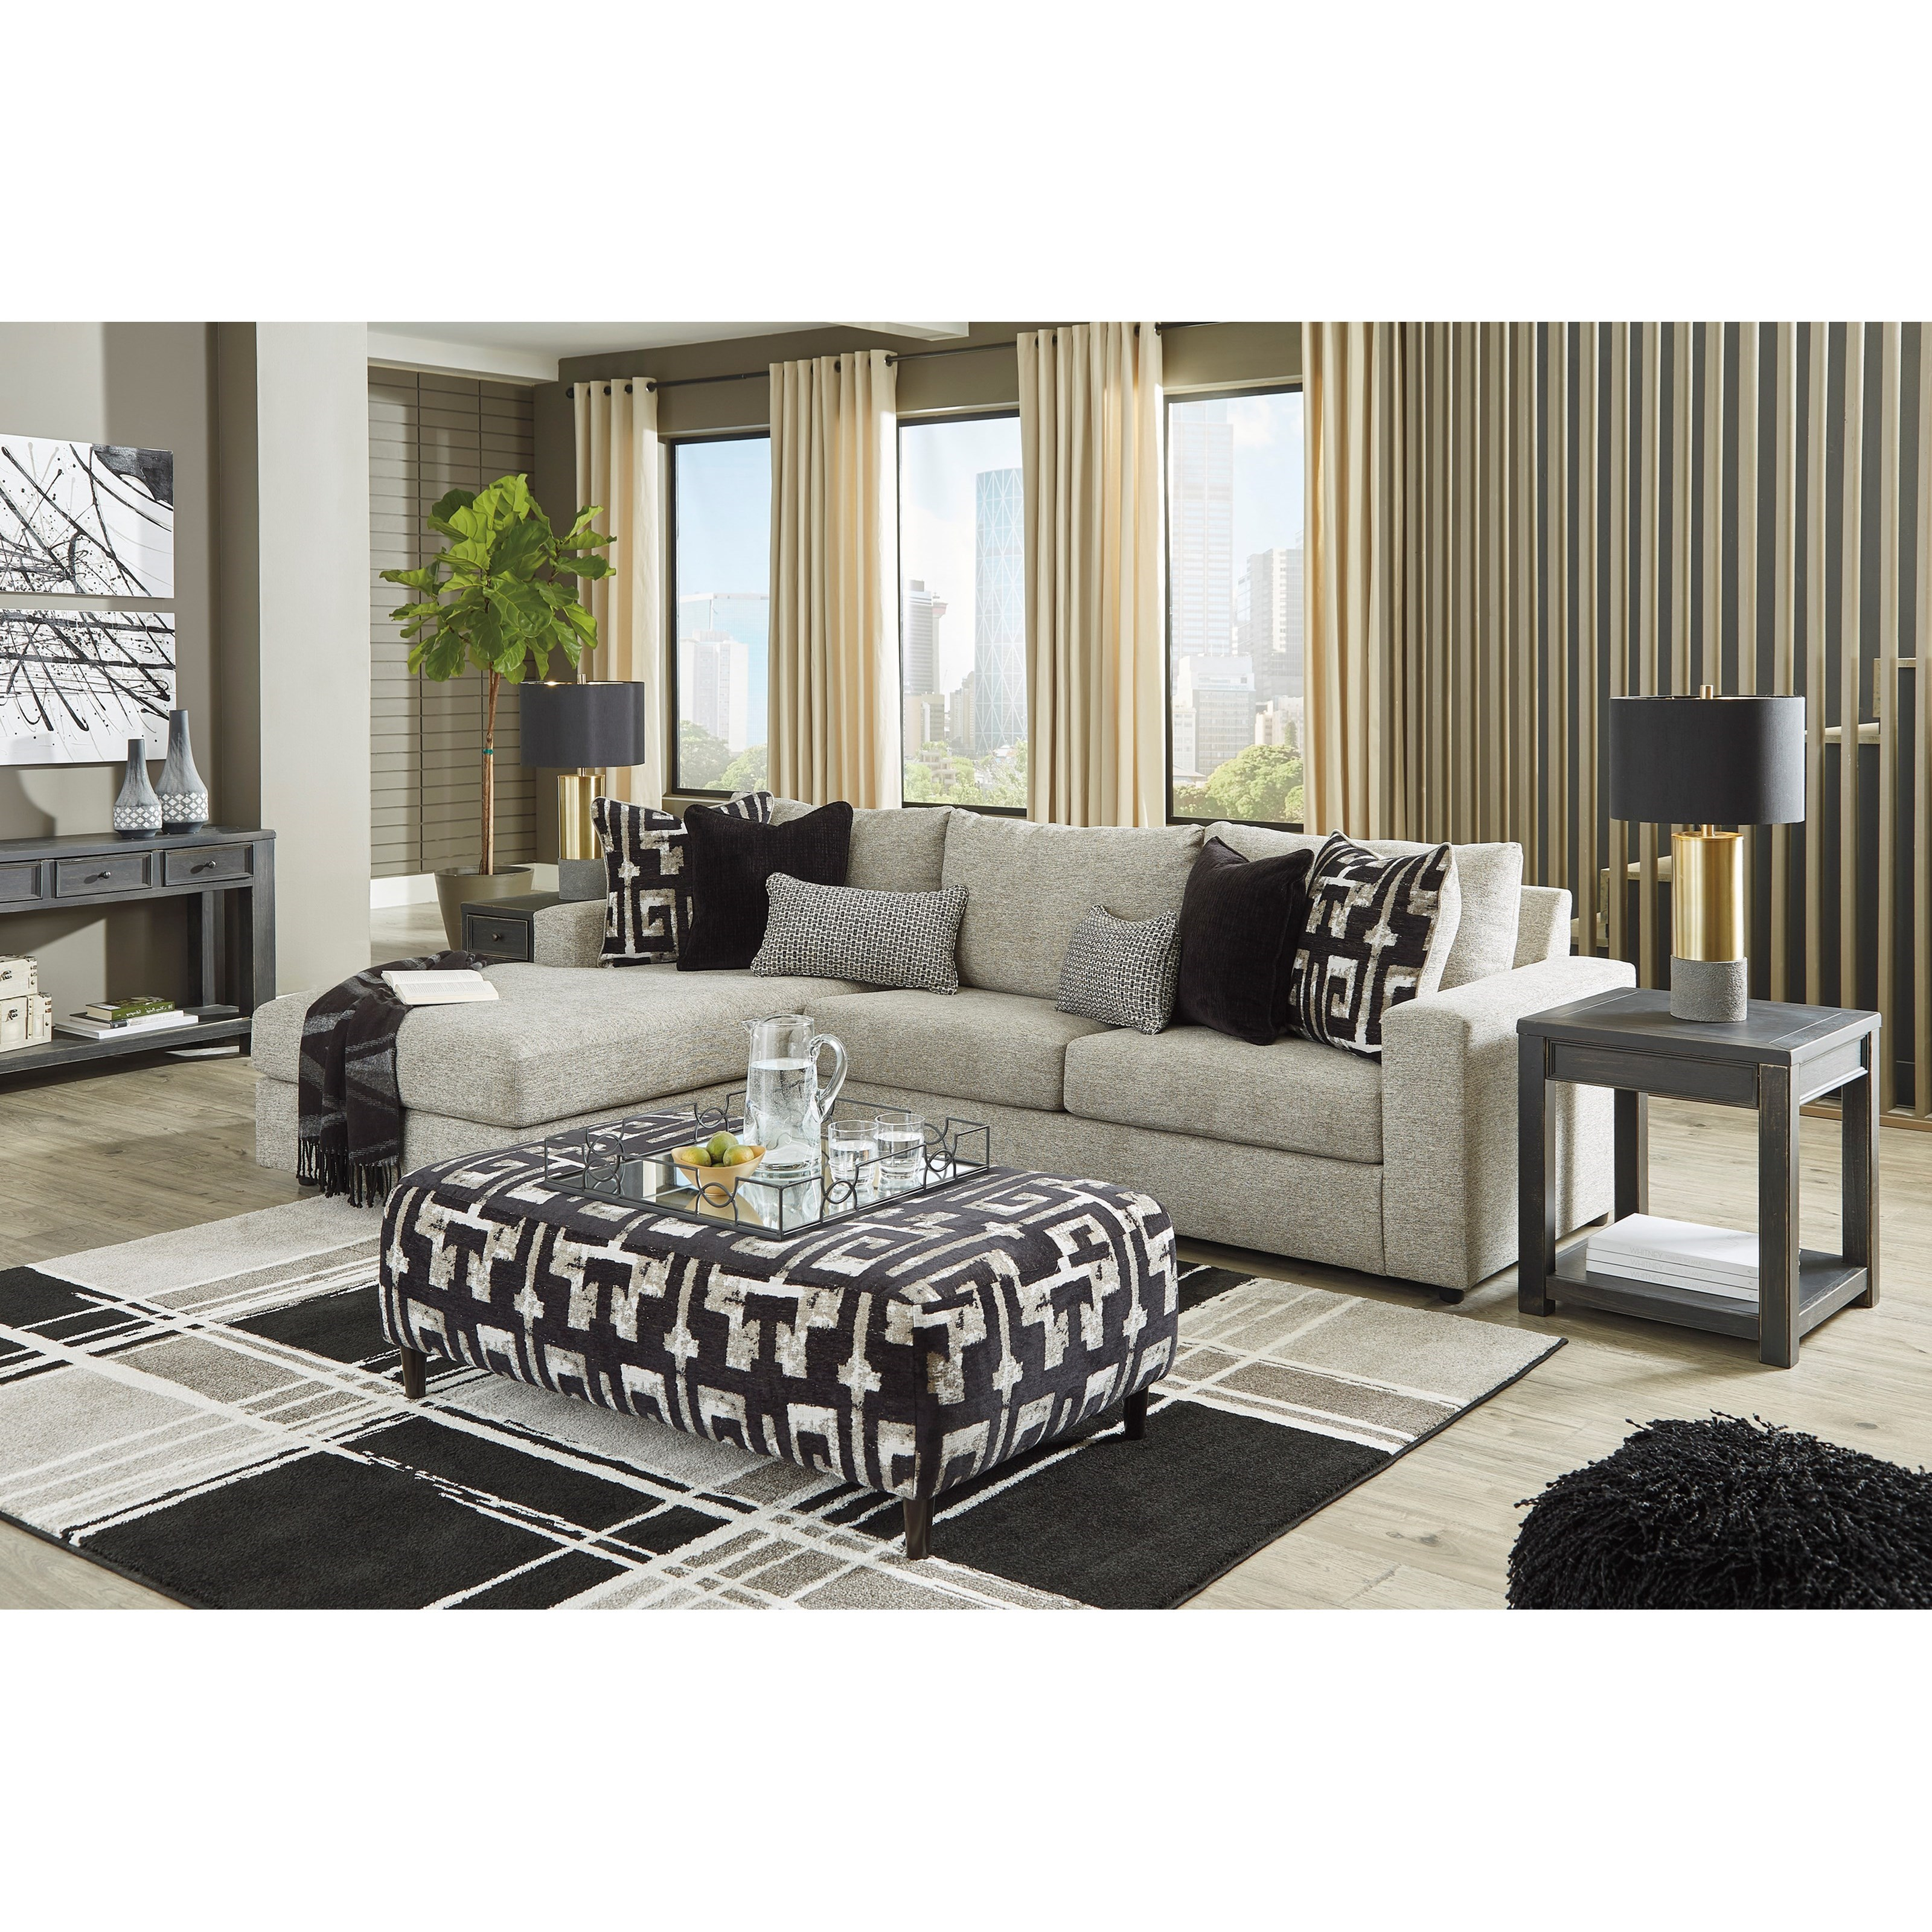 Ravenstone Living Room Group by Ashley (Signature Design) at Johnny Janosik